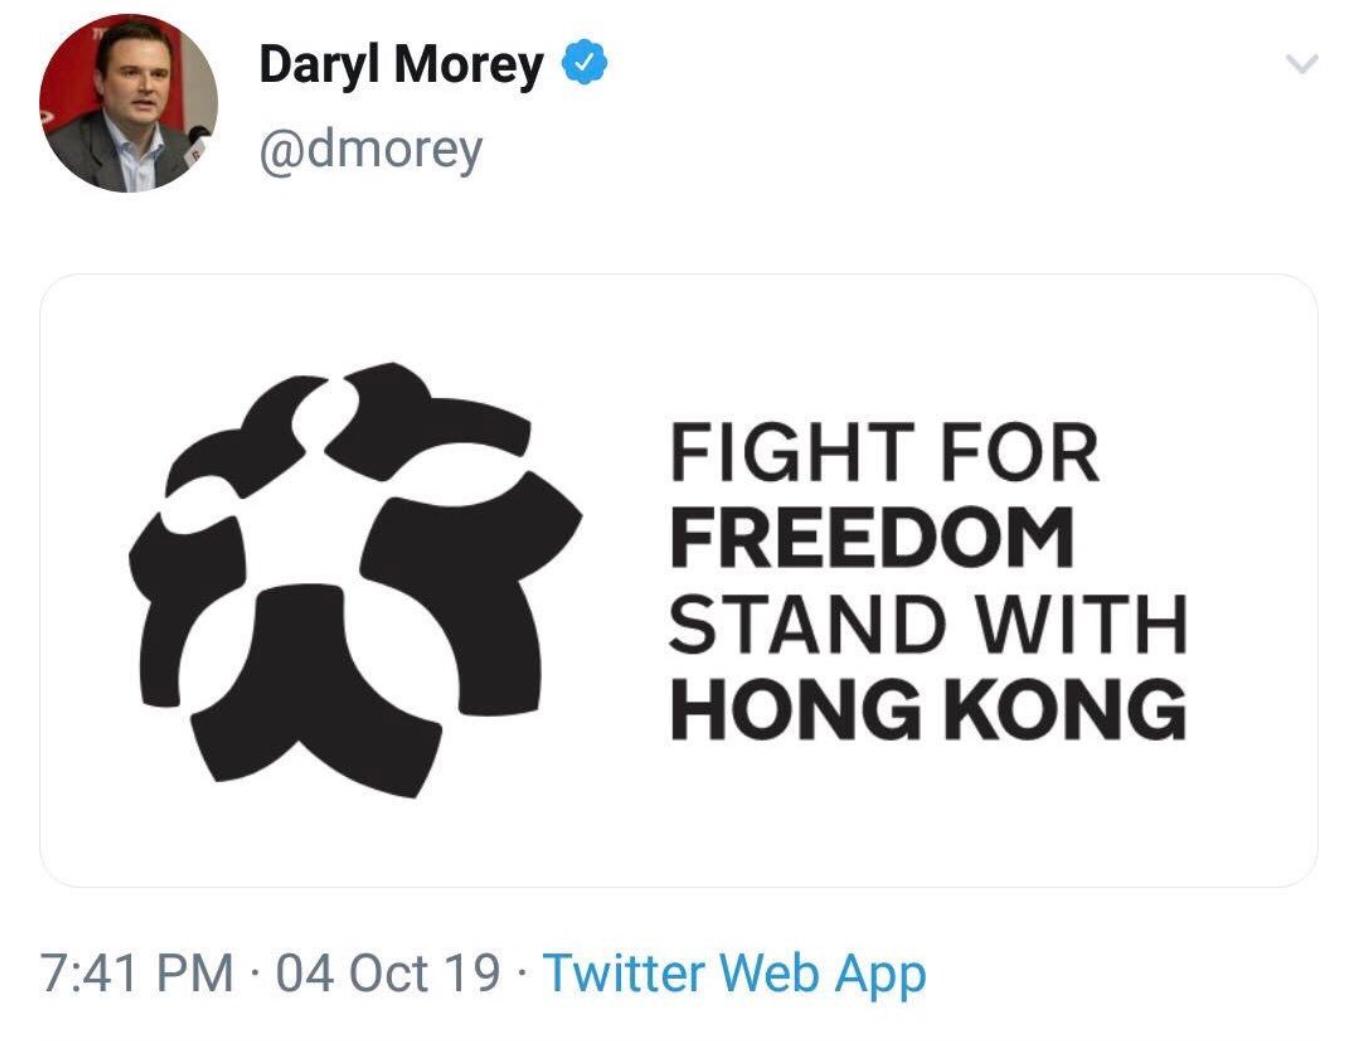 Daryl Morey mess: NBA caves to China because of money